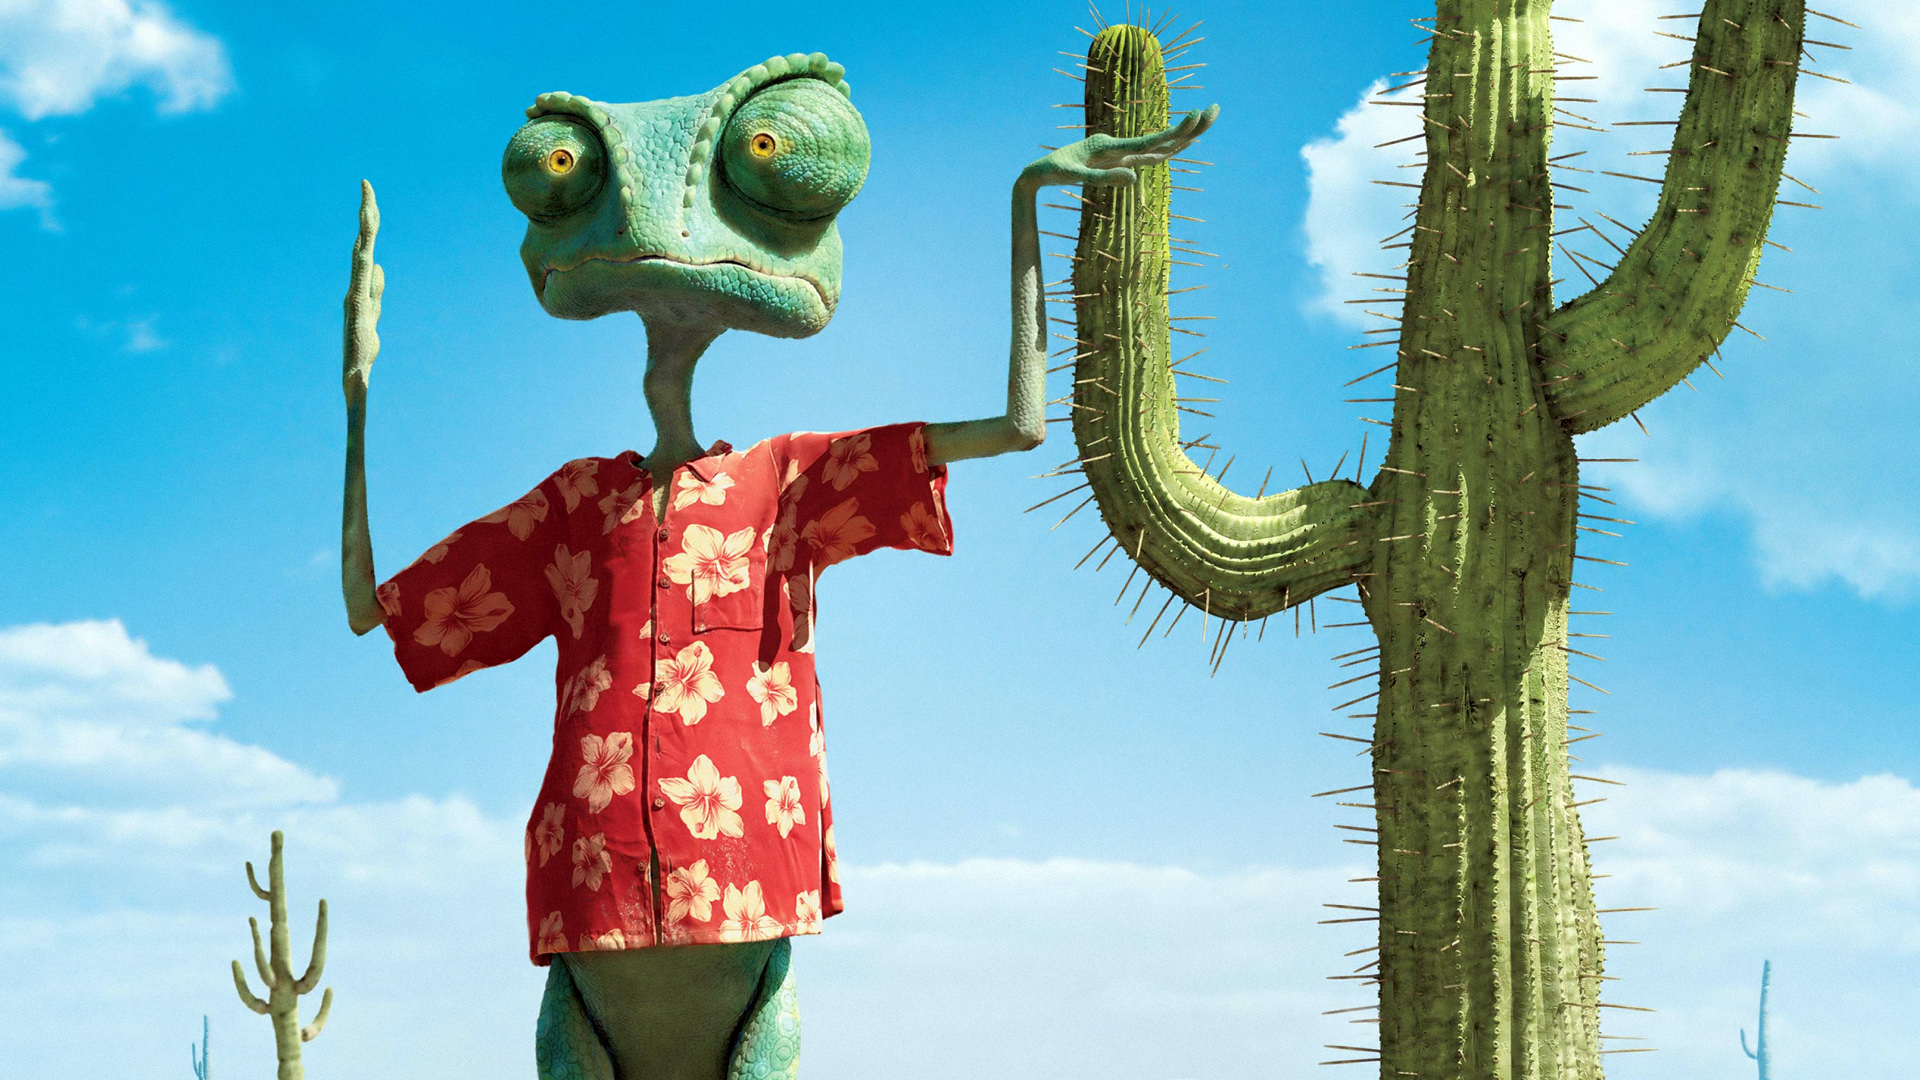 Cacti Rango Cactus Wwwpicsbudcom